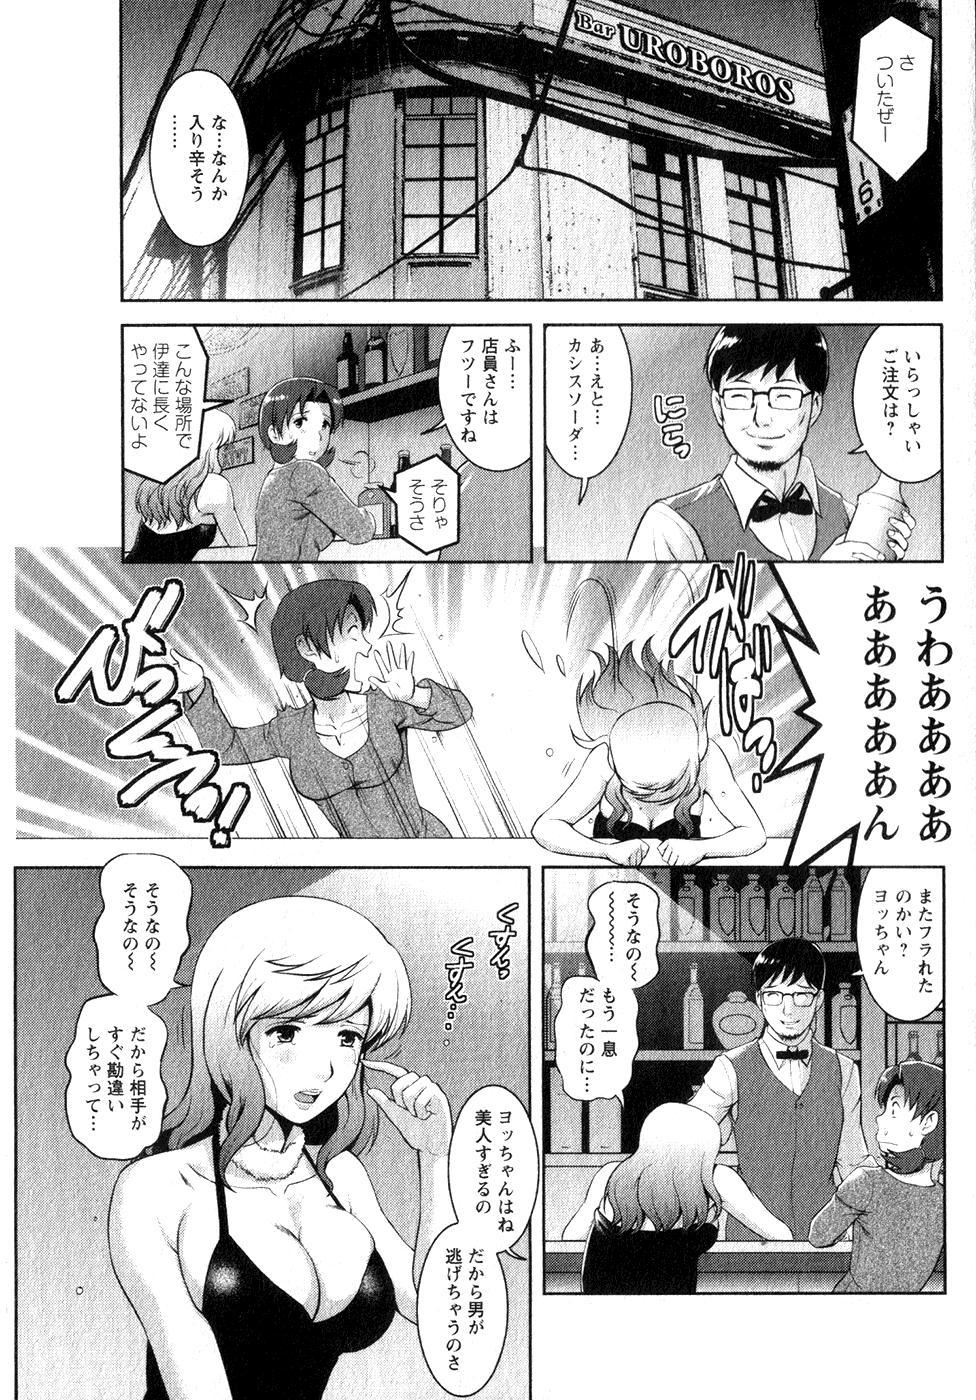 [Saigado] Kururi-san to Hirari-san Vol. 1 (Complete) 94